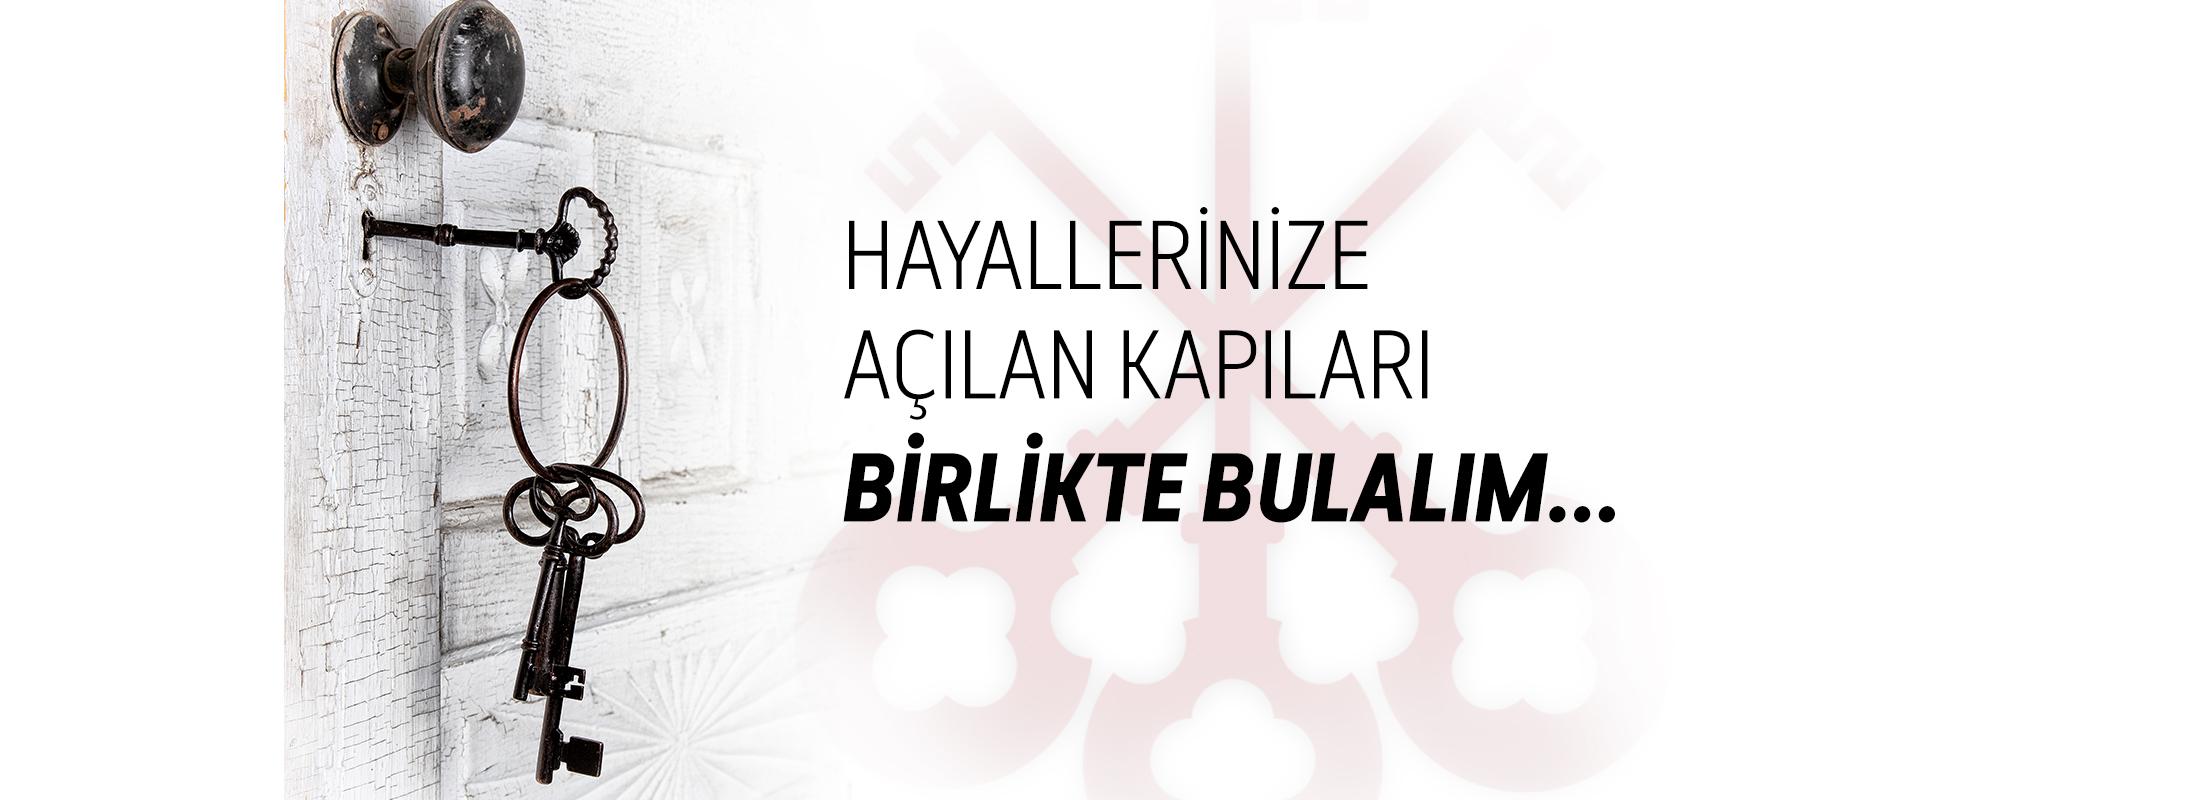 www.partners.com.tr PARTNERS GAYRİMENKUL A.Ş.